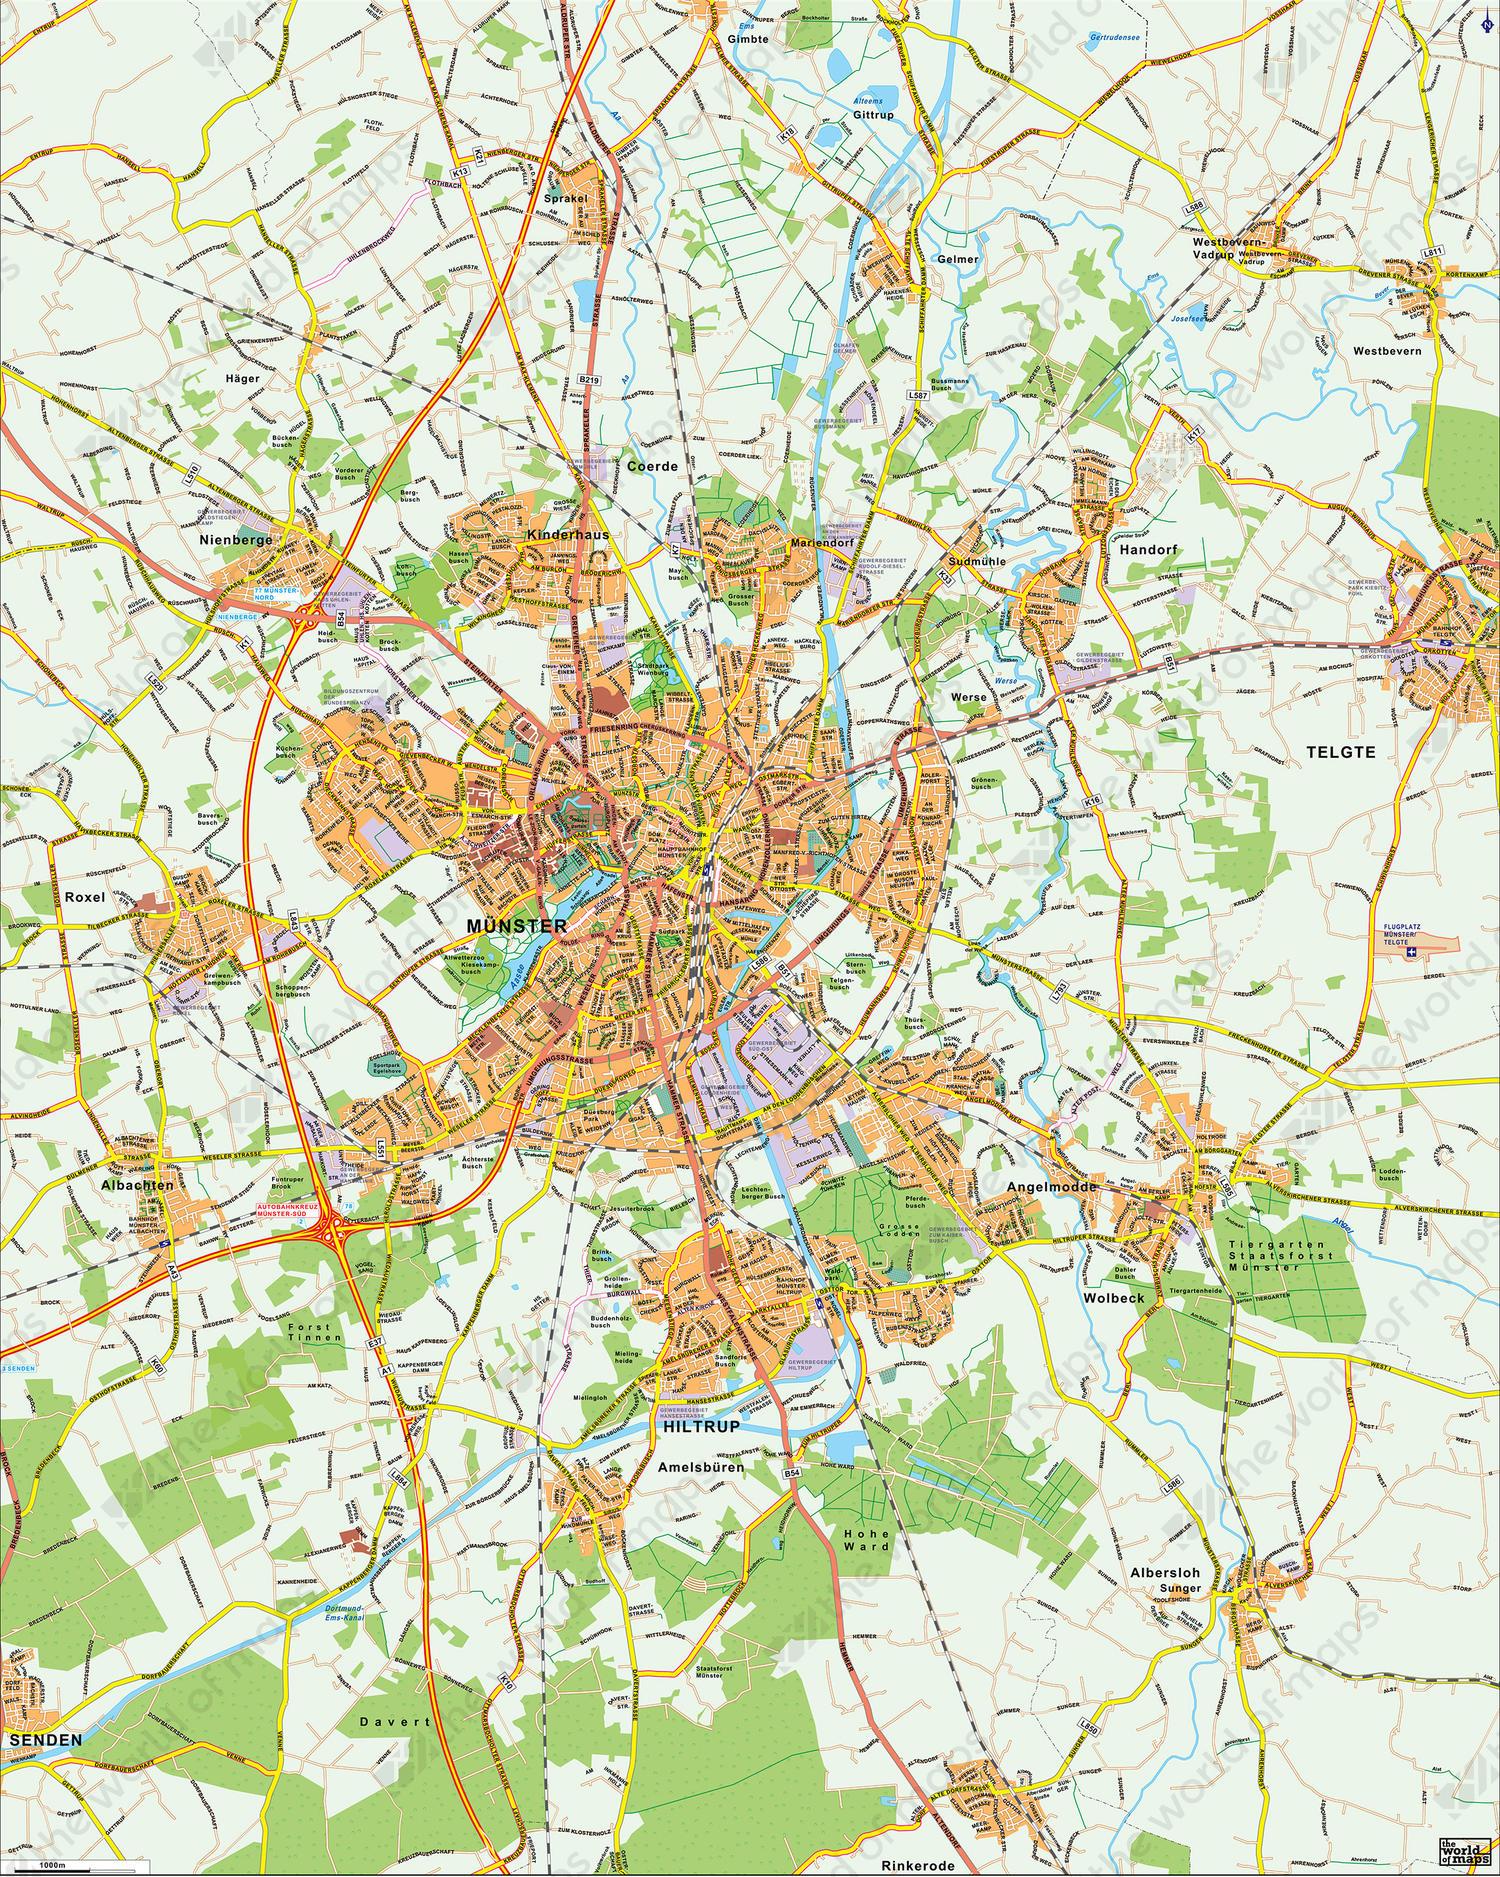 Digital City Map Mnster 178 The World of Mapscom